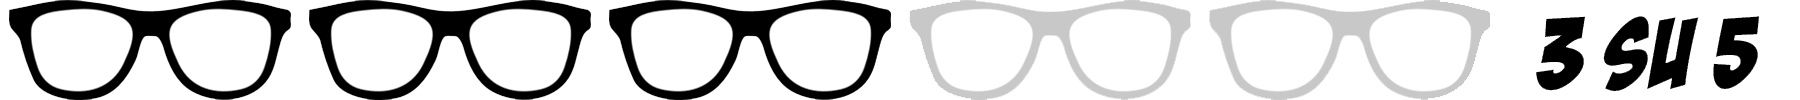 occhiali nerd 3 su 5